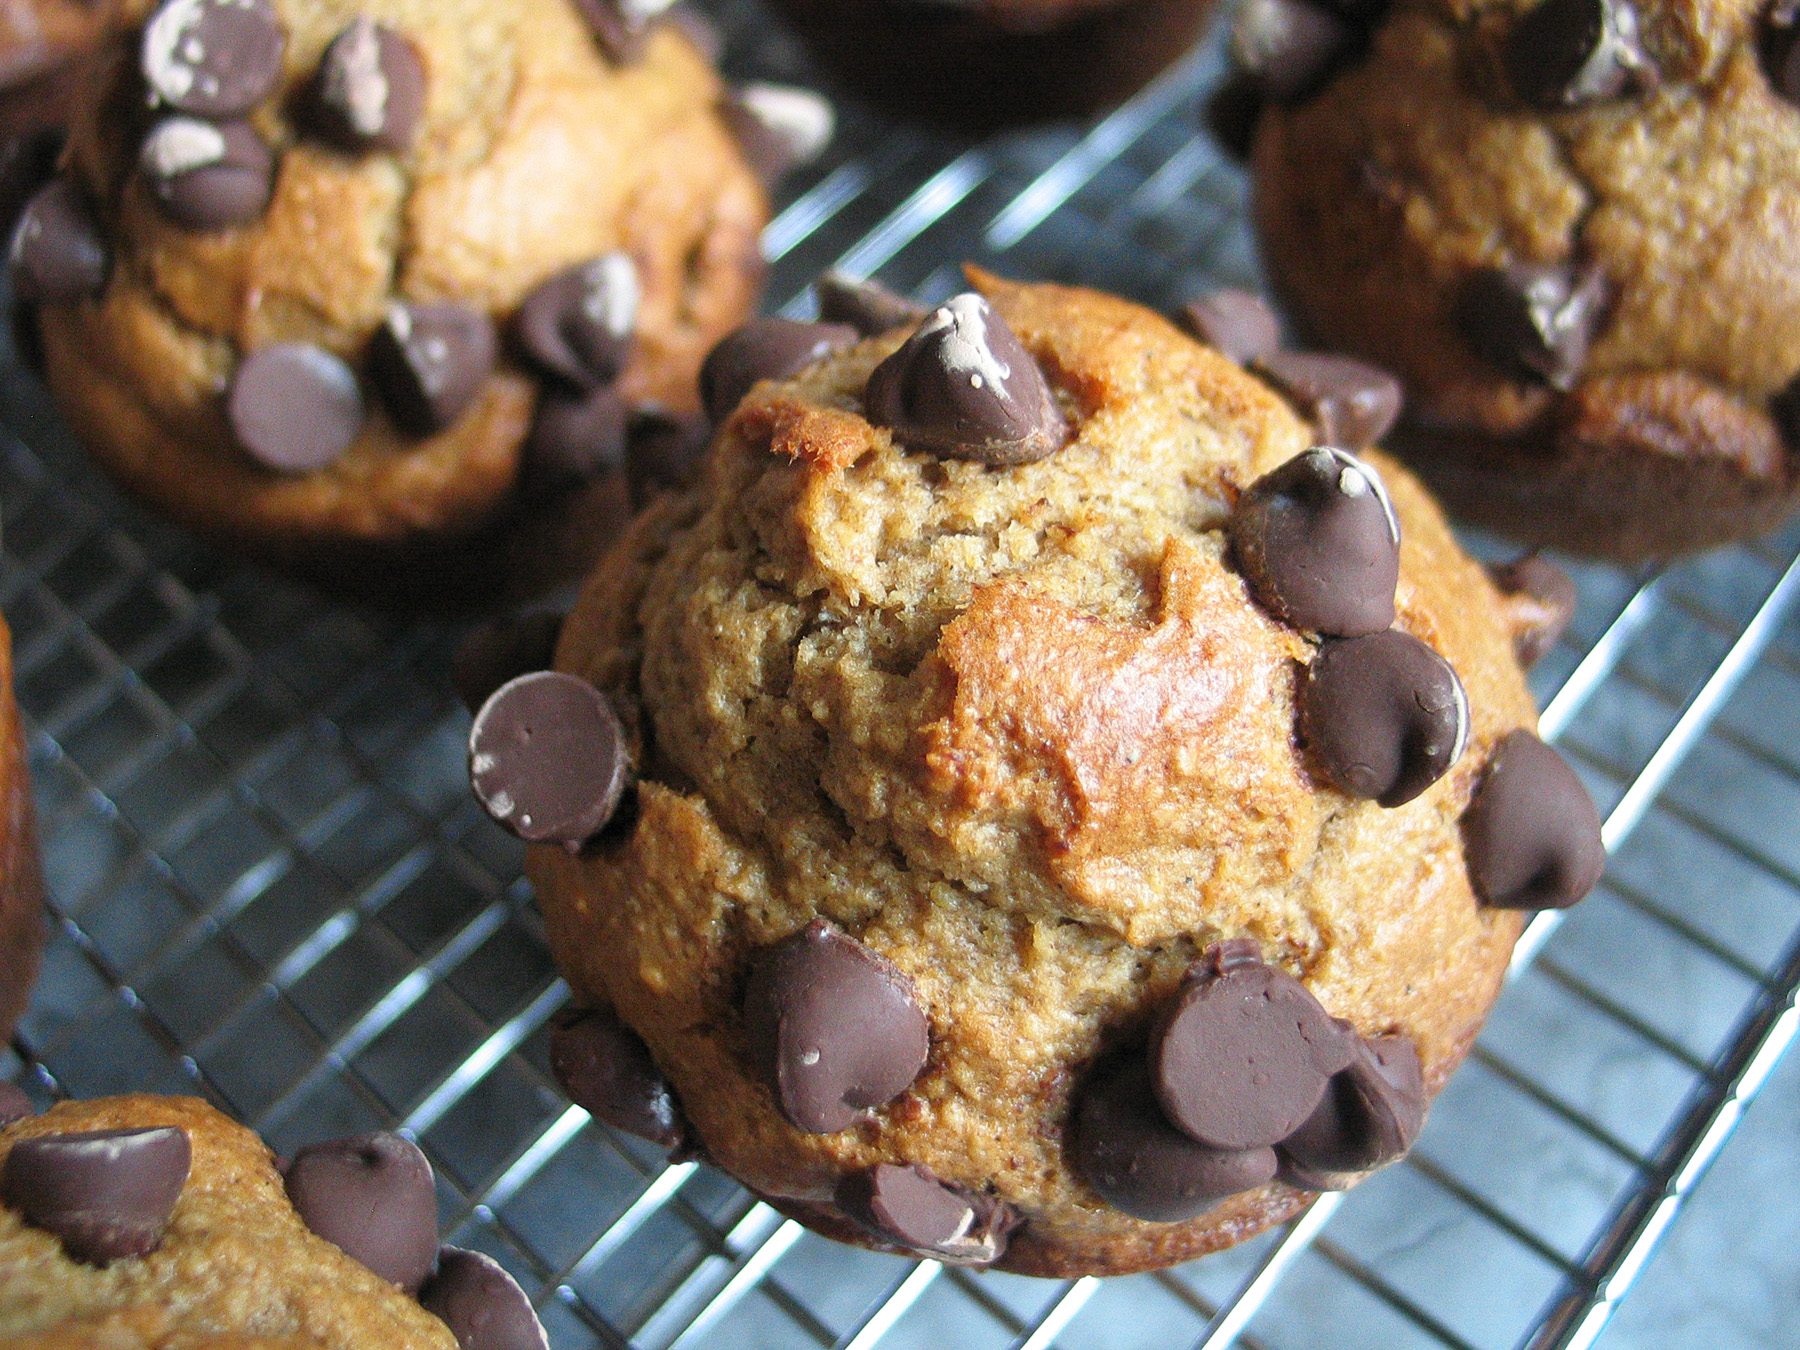 Chocolate Tahini Blender Muffins